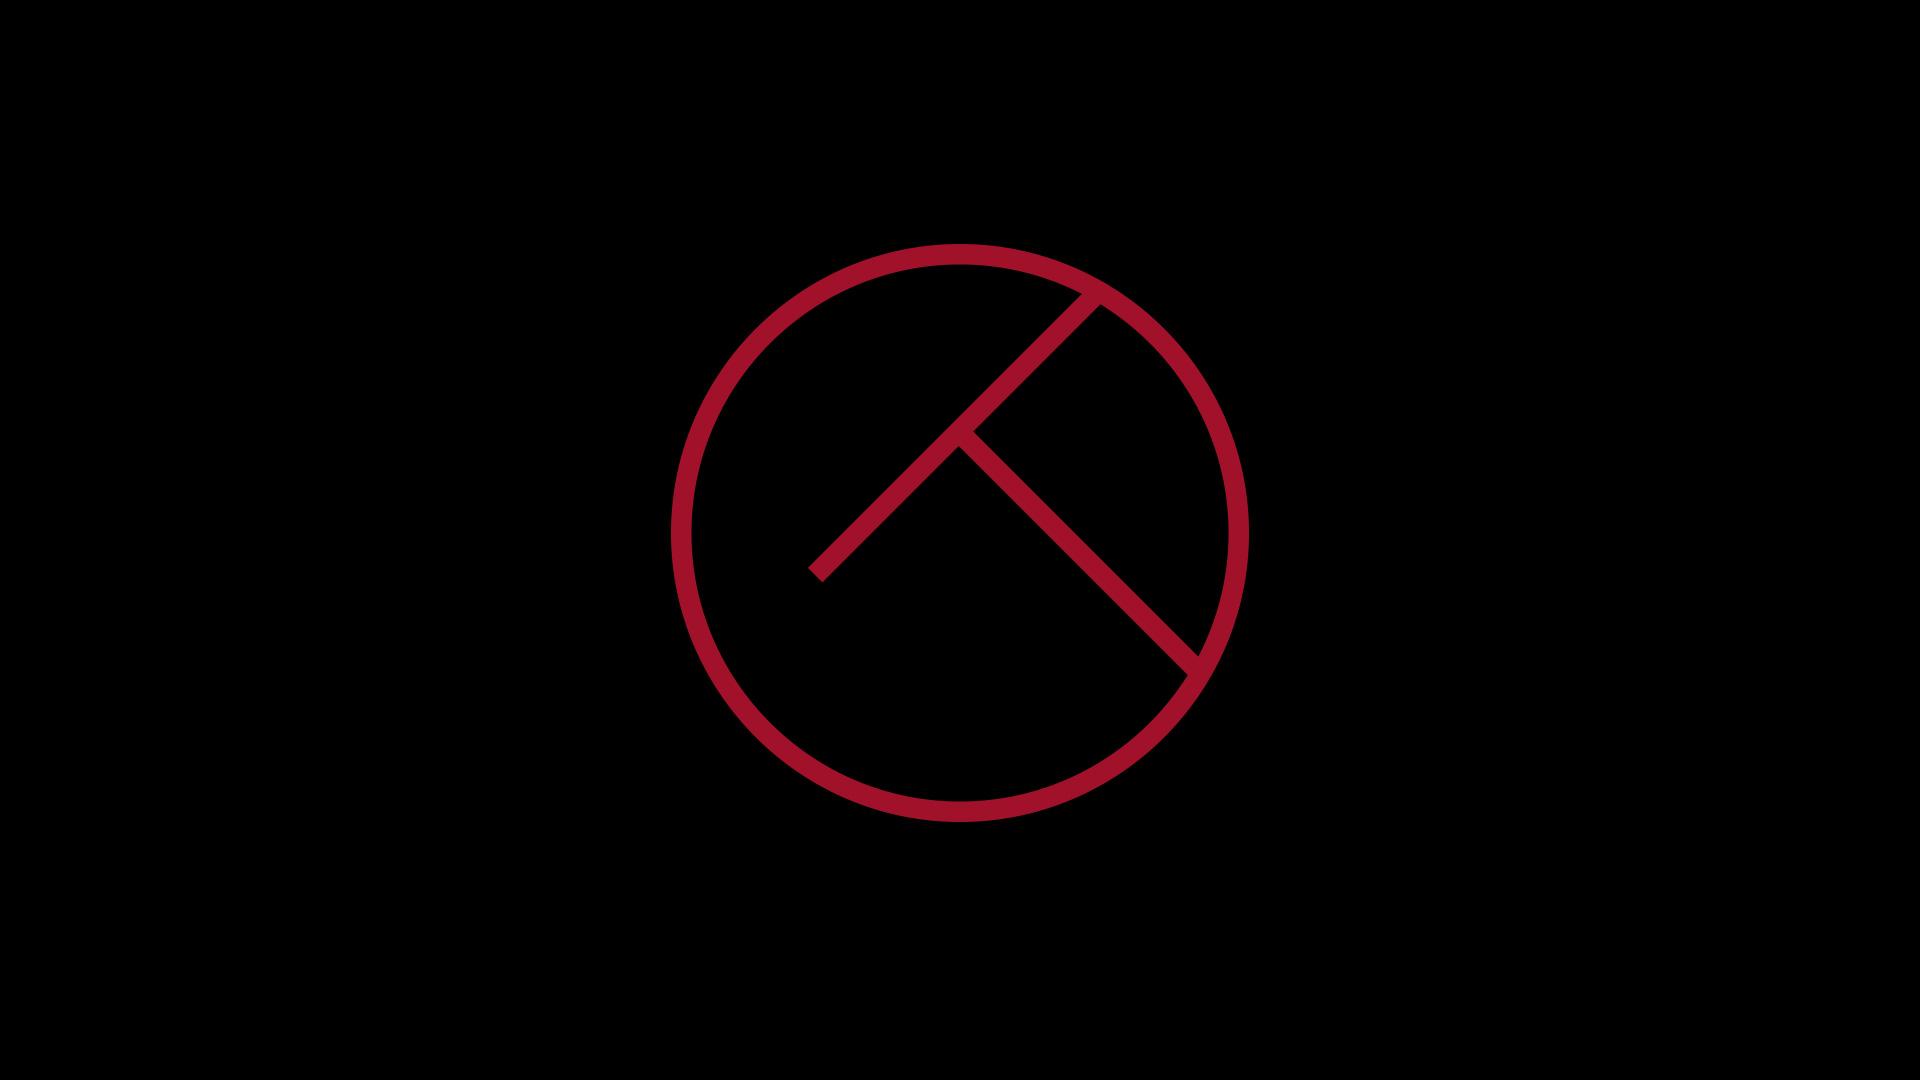 symbol_black_1920px